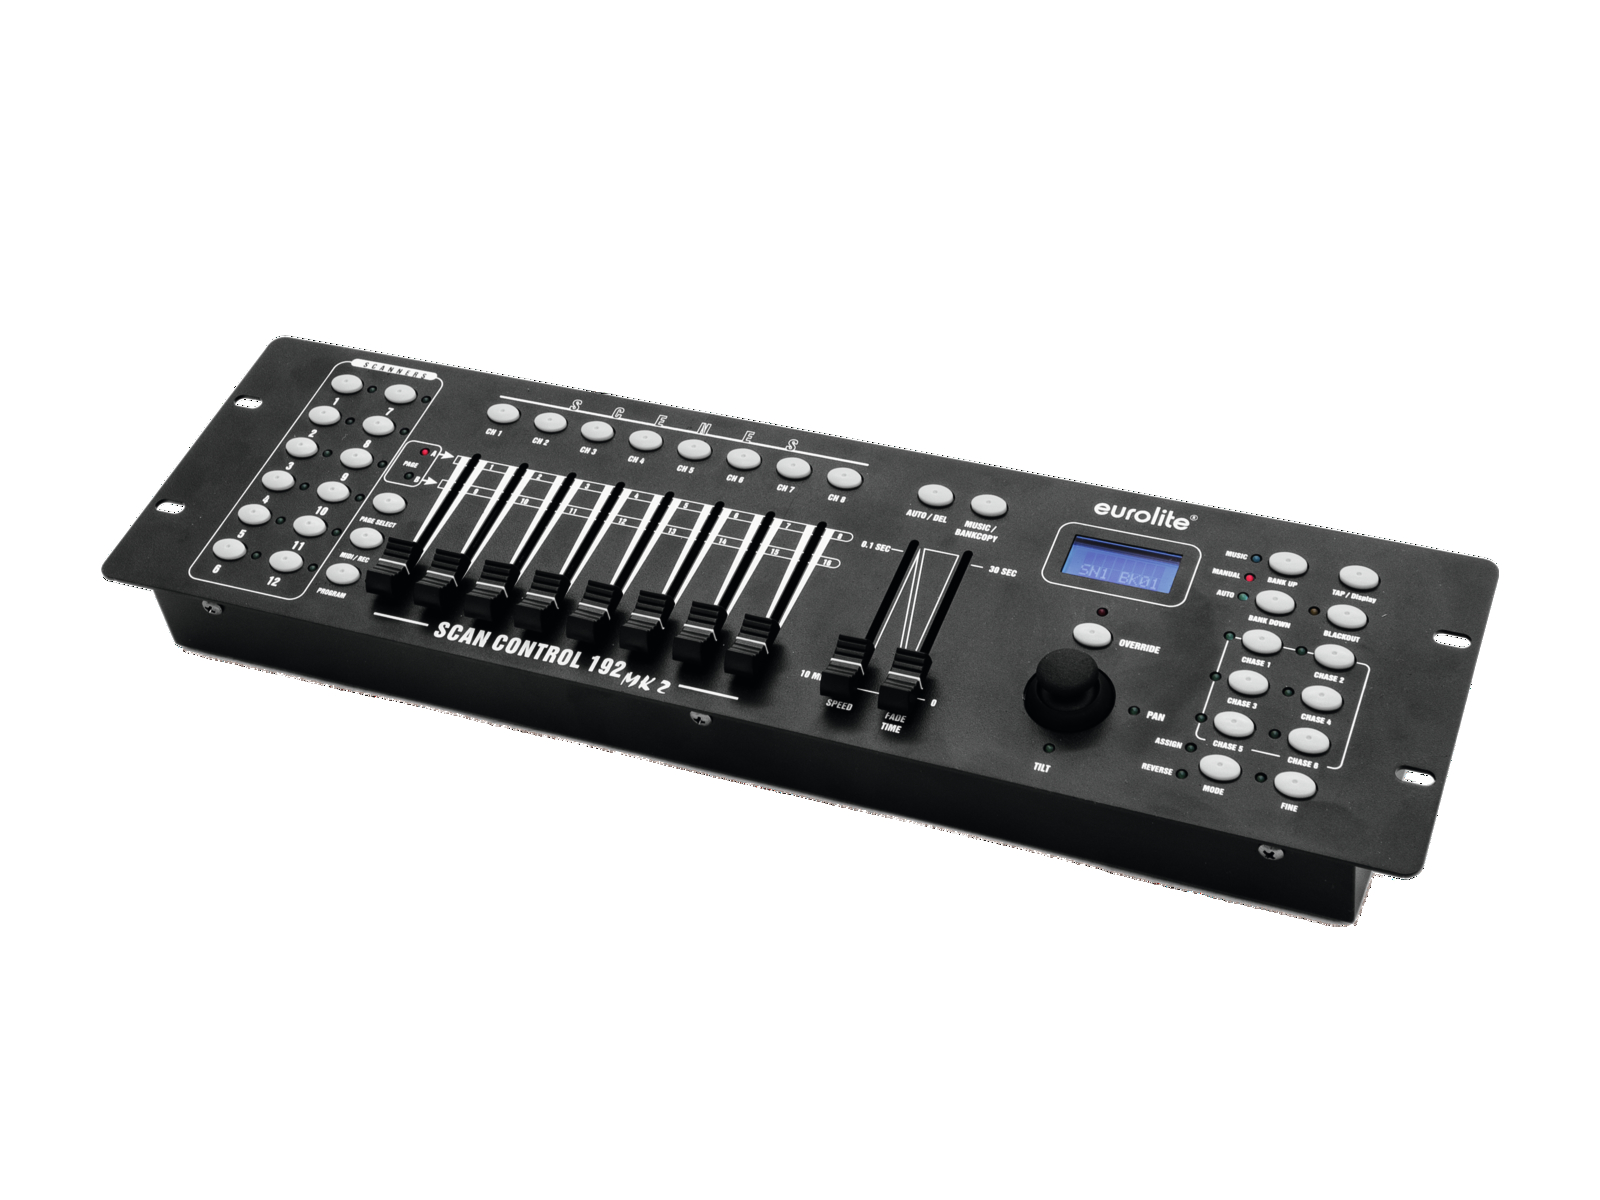 eurolite-dmx-scan-control-192-mk2-controller